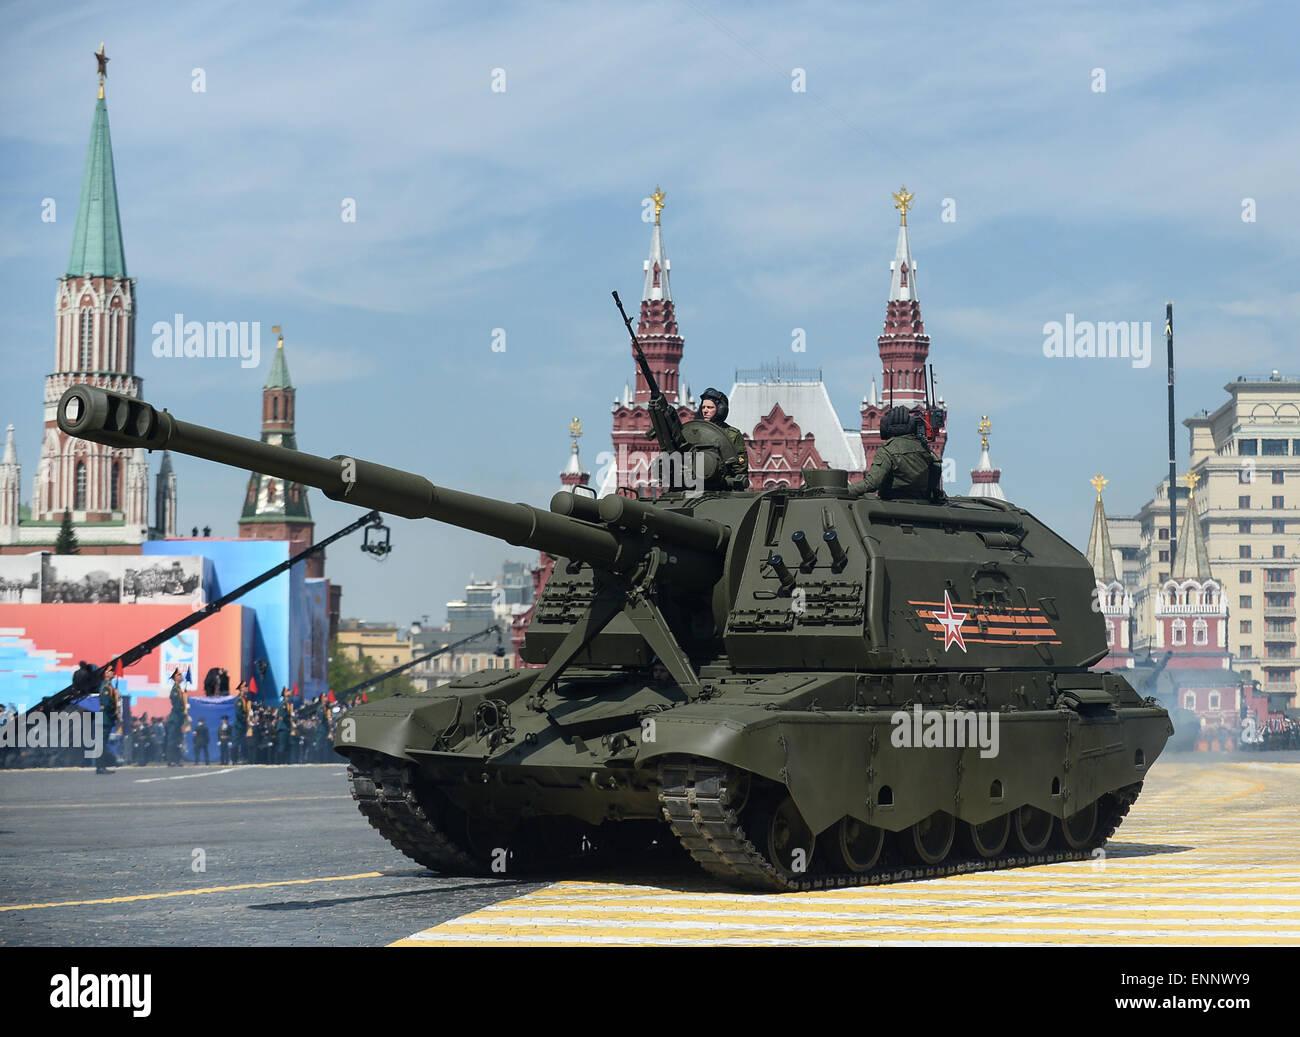 Self Propelled Cart >> Moscow, Russia. 9th May, 2015. A 2S35 Koalitsiya-SV self-propelled Stock Photo: 82230605 - Alamy